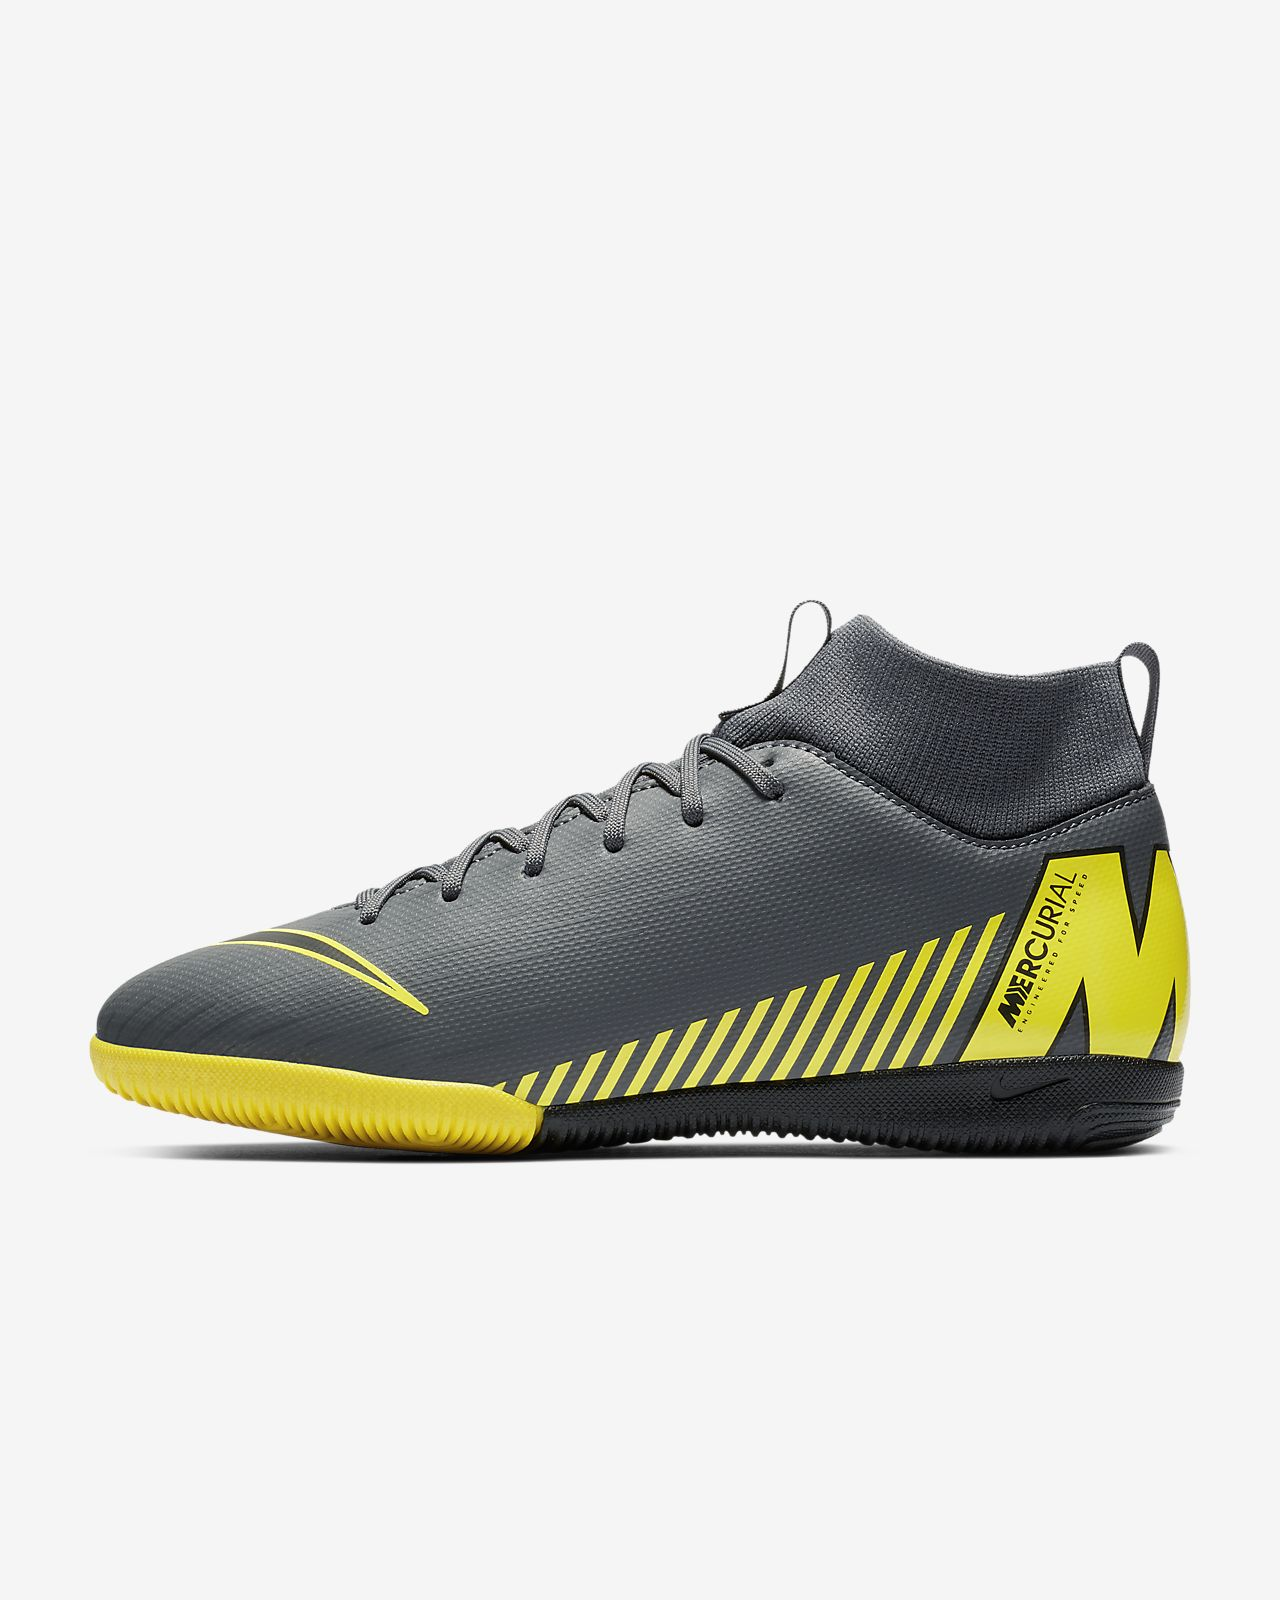 online store 716b4 fa40b ... Nike Jr. SuperflyX 6 Academy IC Botas de fútbol sala - Niño/a y niño